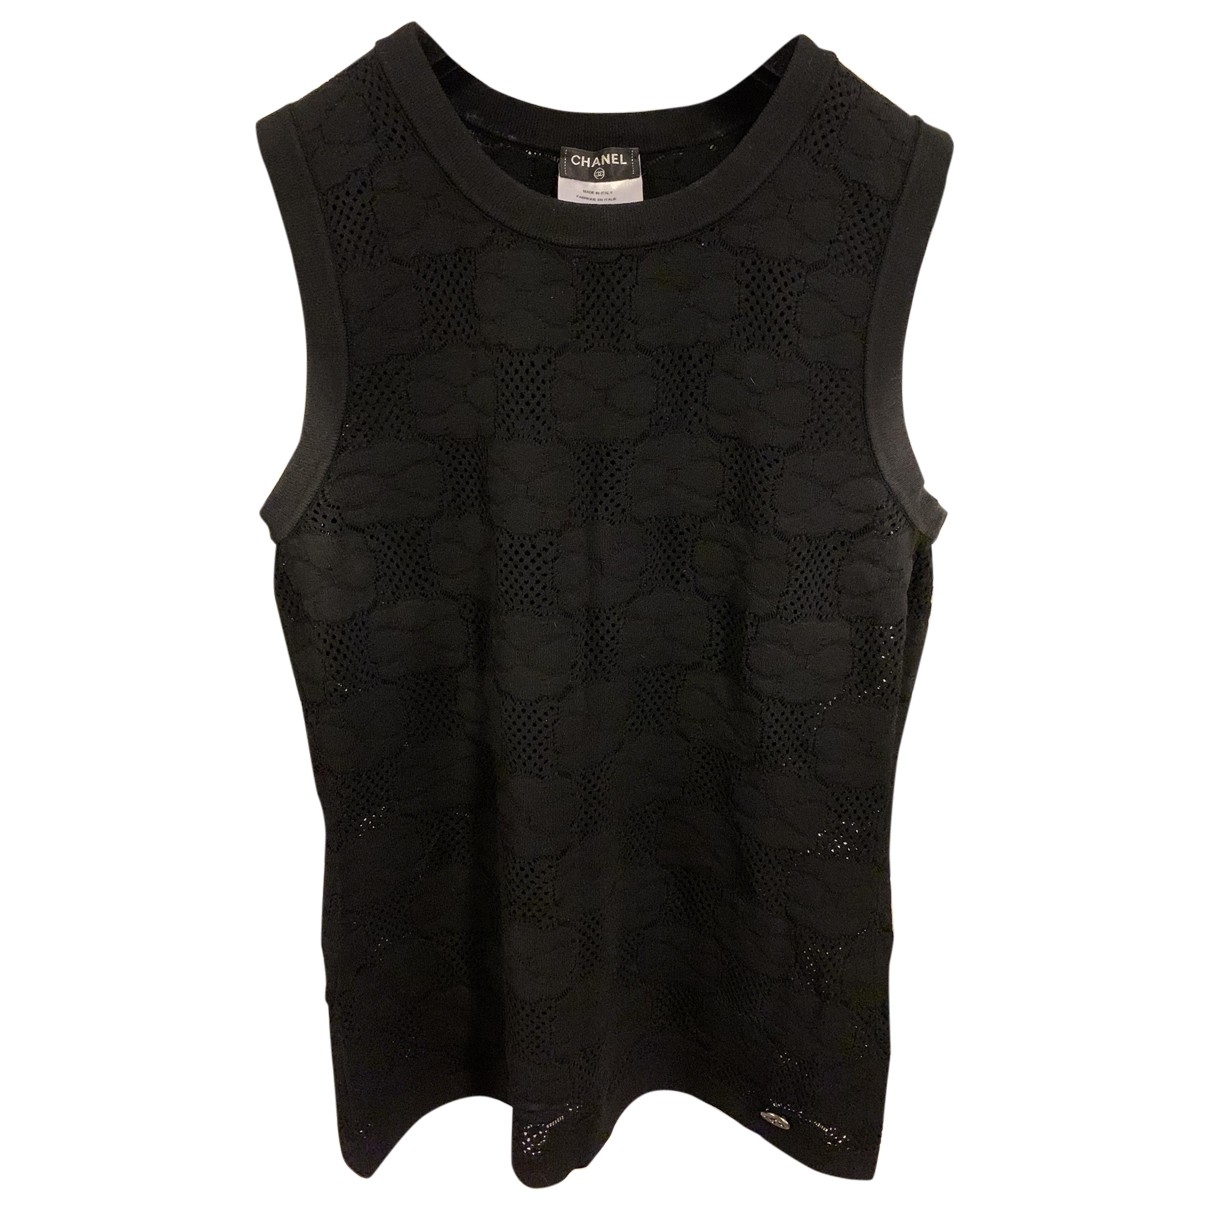 Chanel \N Black  top for Women 36 FR